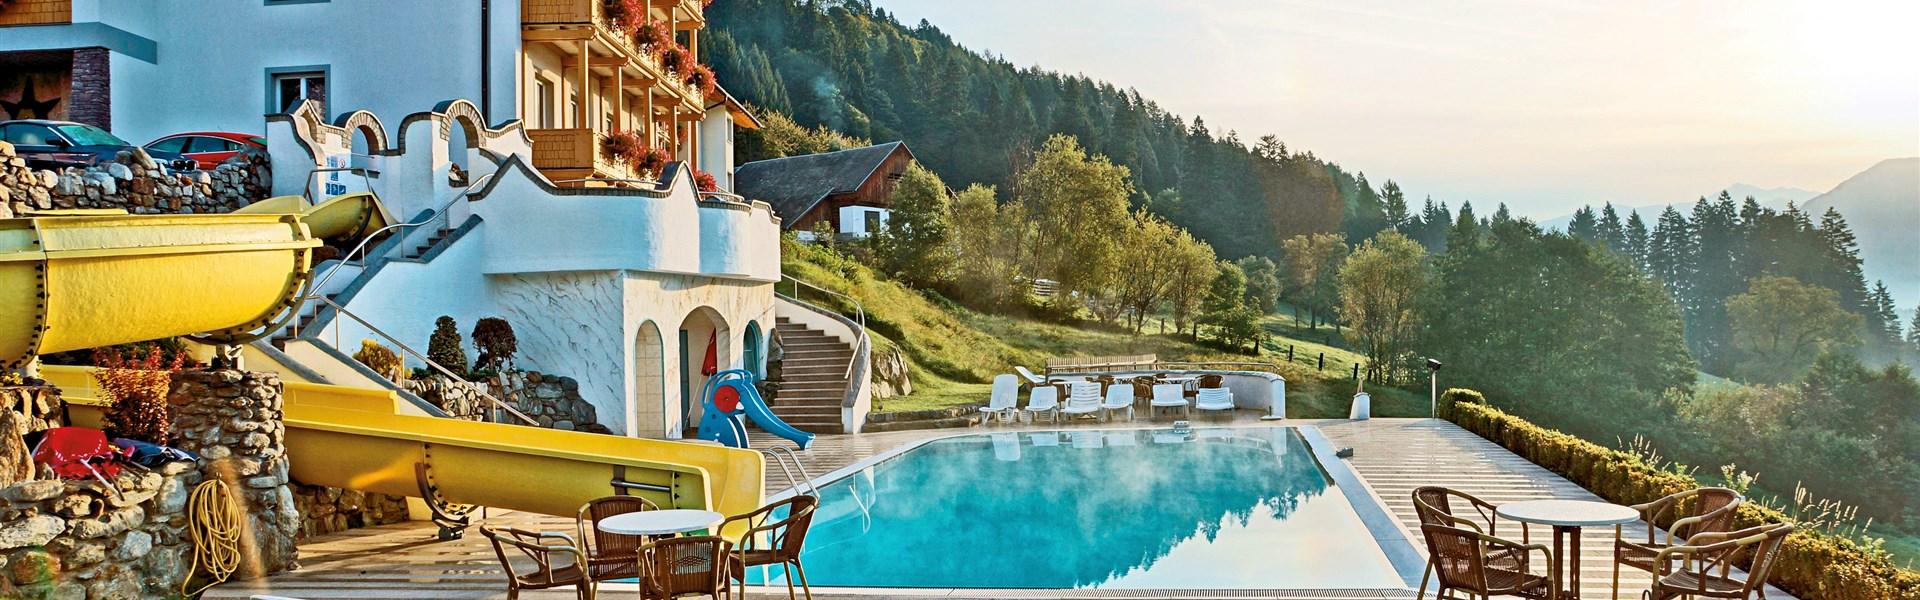 Ferienhotel Glocknerhof -